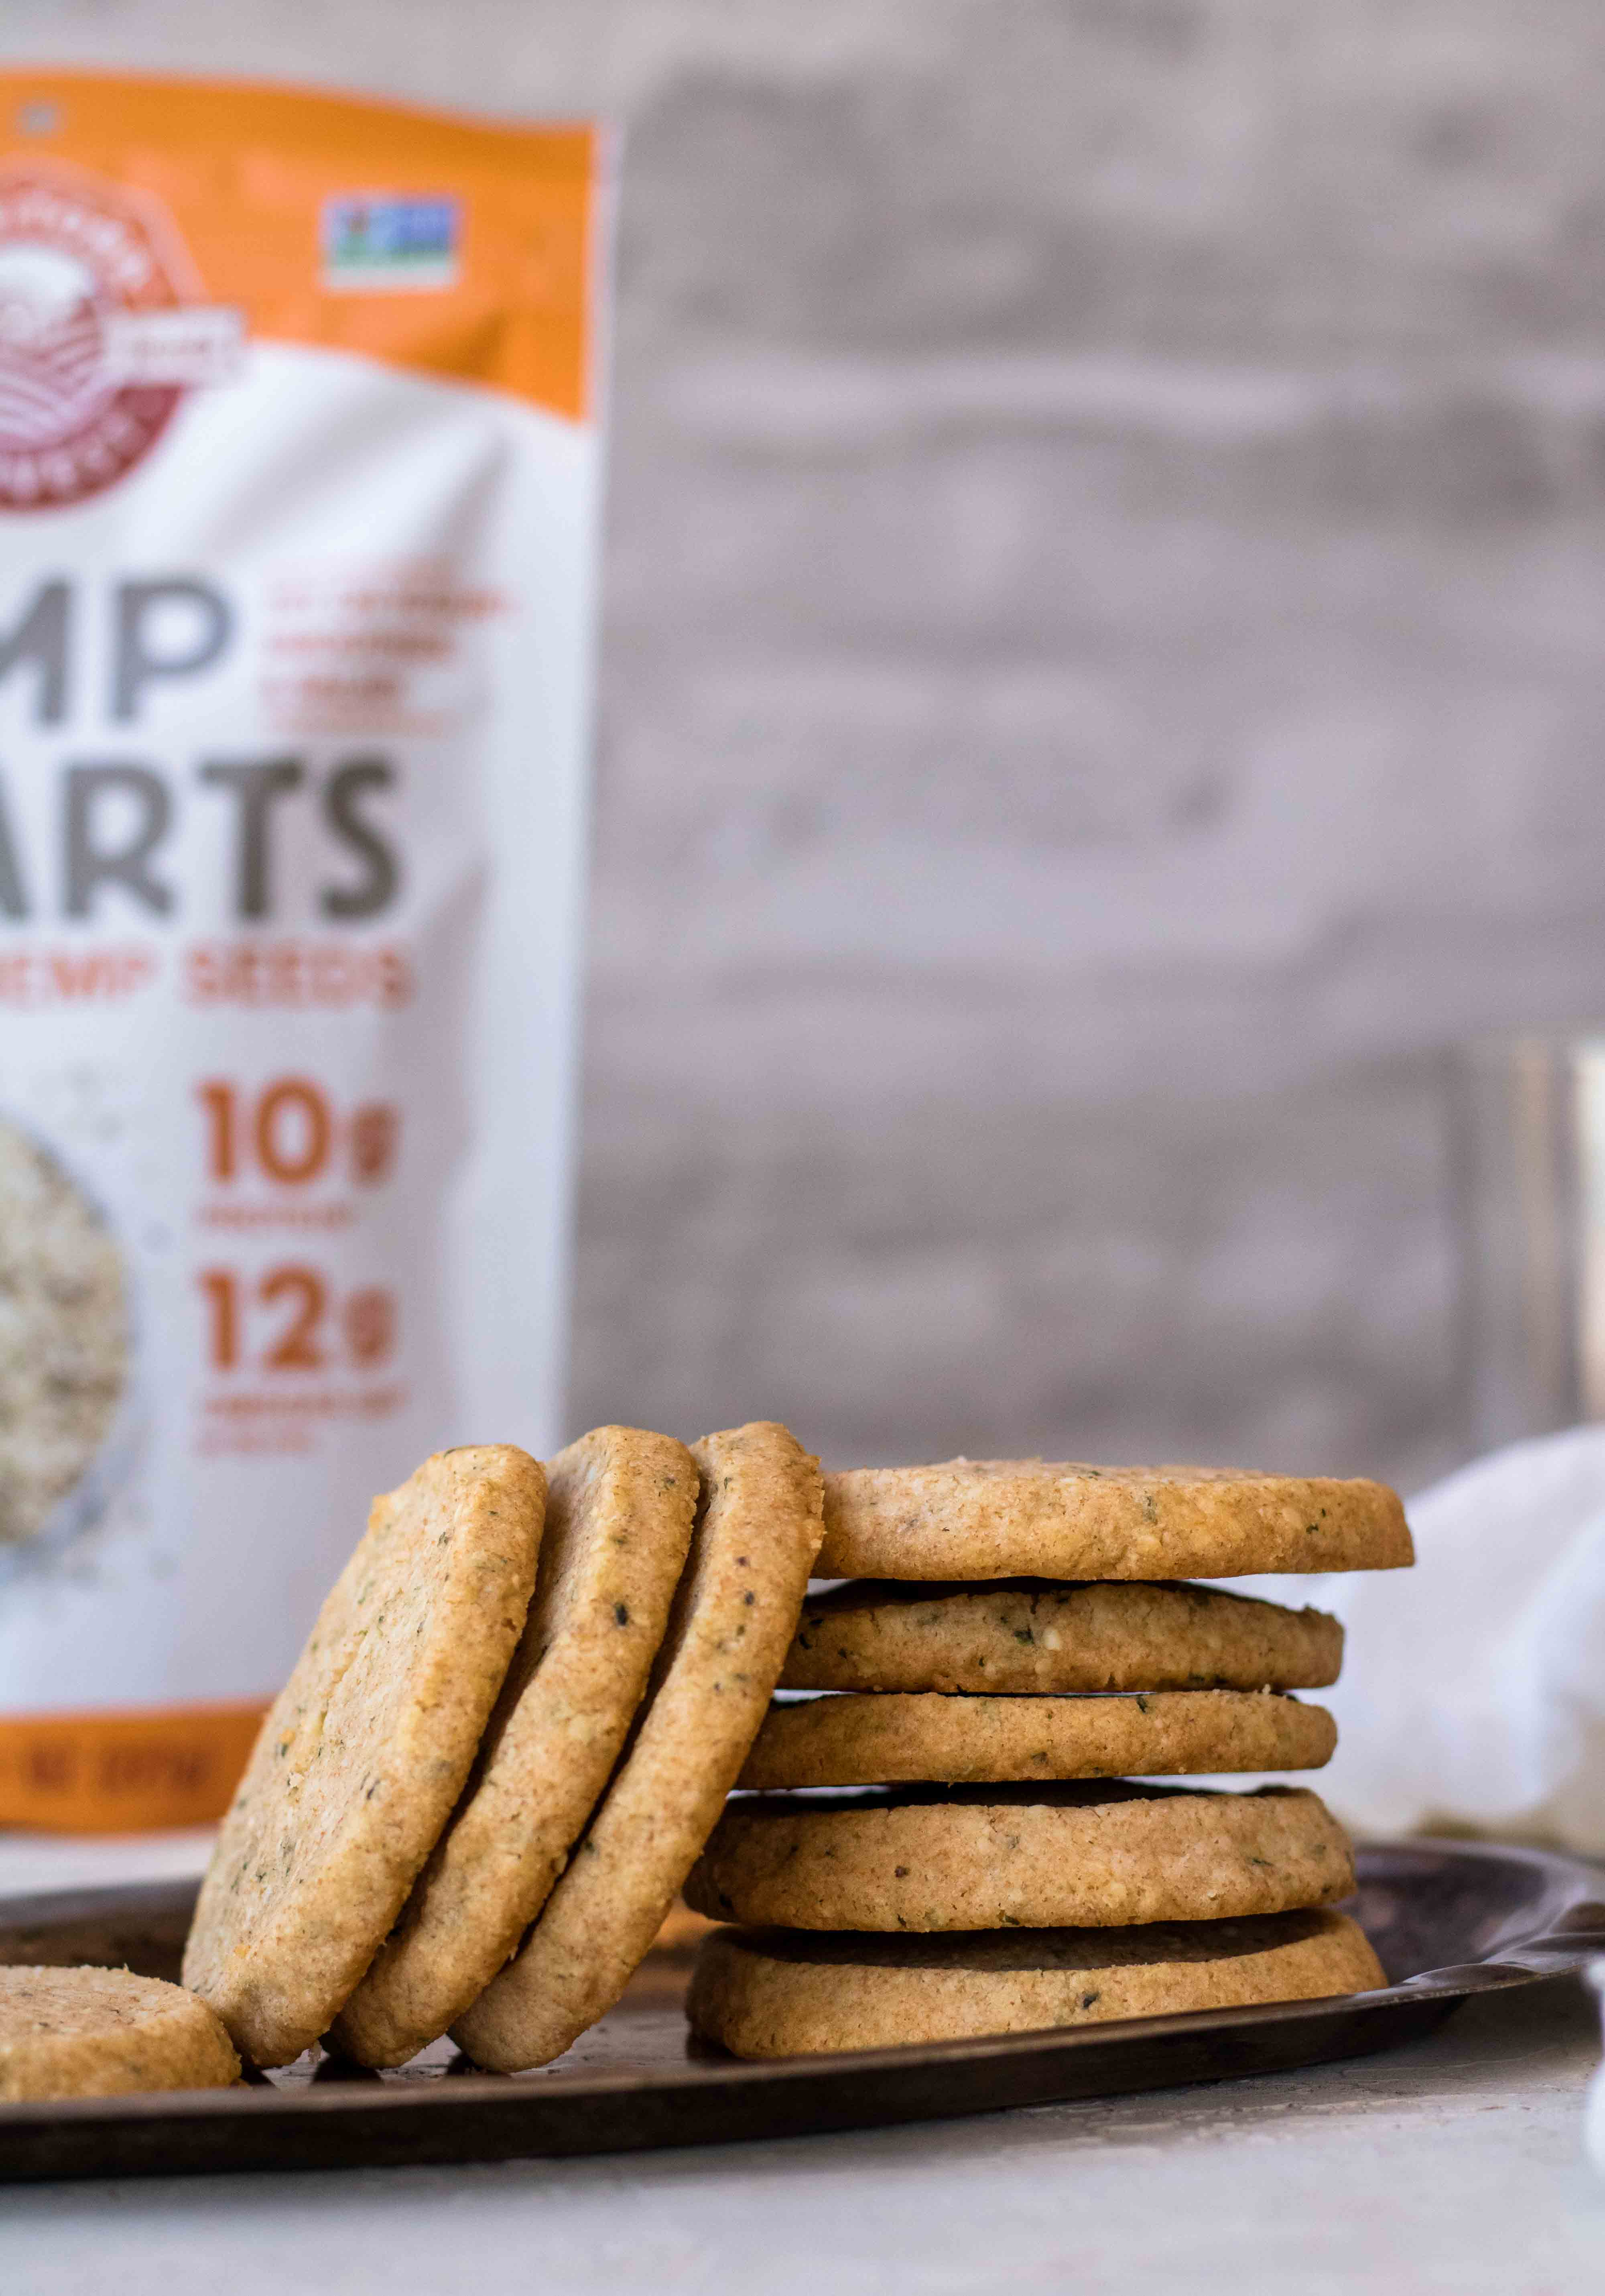 Whole Wheat Sablés With Hemp Seeds